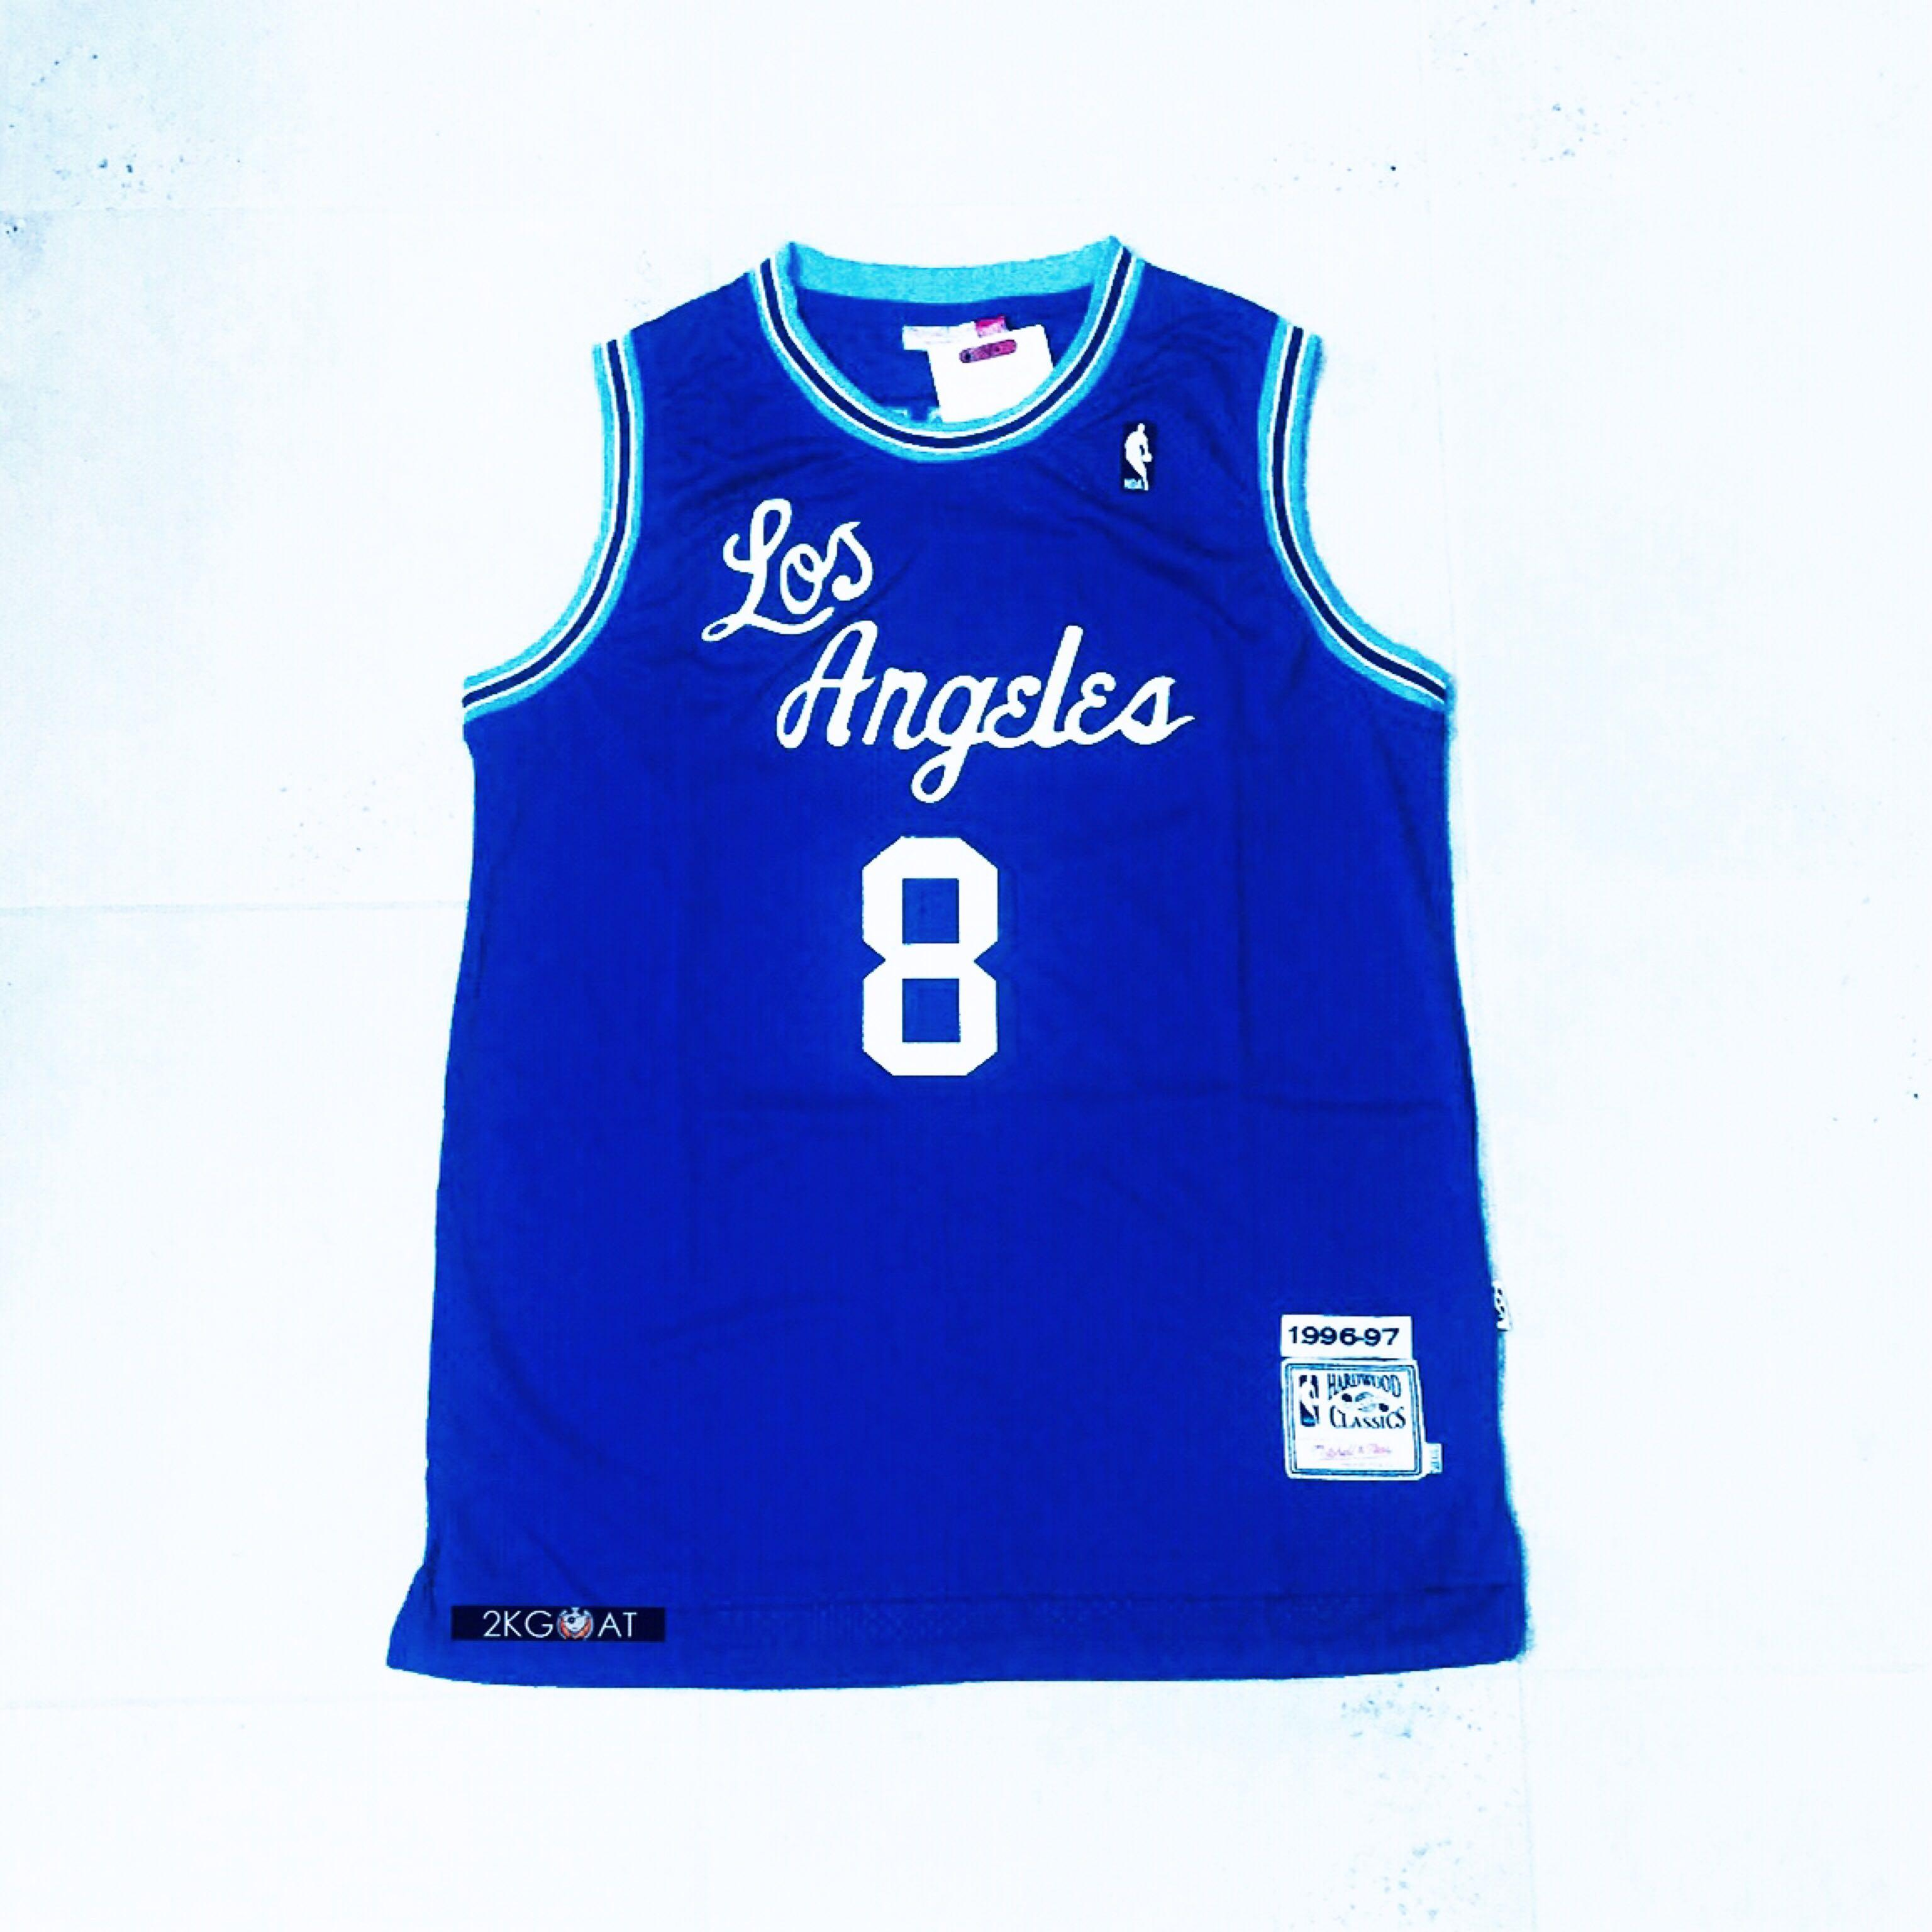 quality design e1e12 a53d0 Kobe Bryant Retro LA LAKERS NBA Jersey, Men's Fashion ...